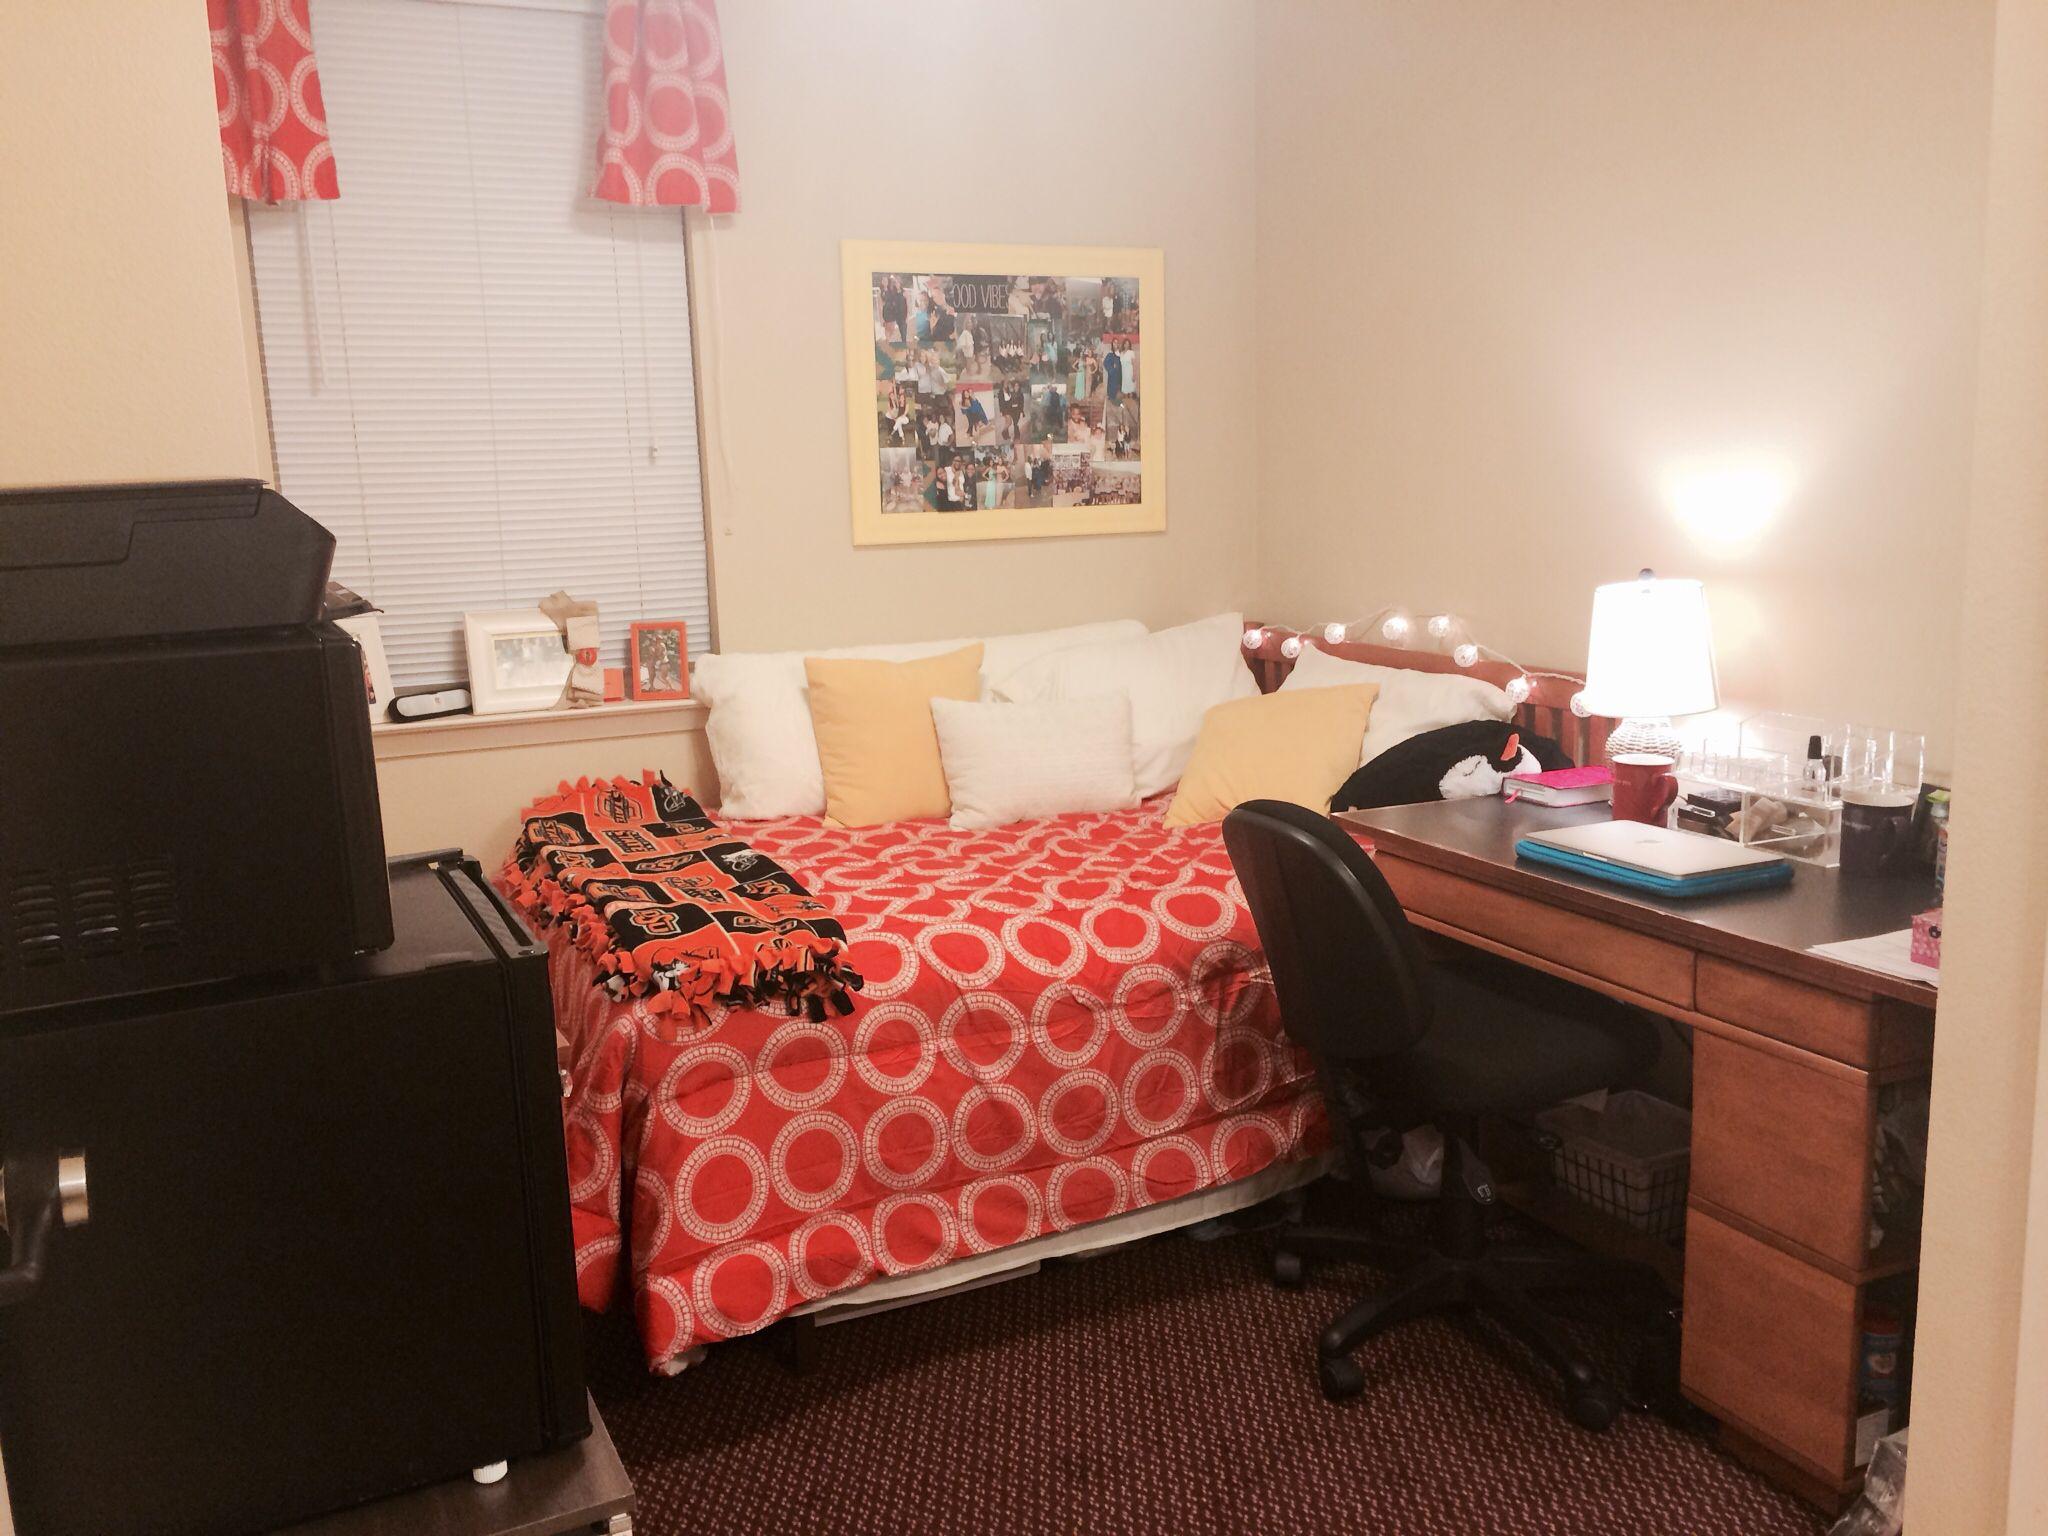 Dorm Room Setup Ideas Oklahoma State University